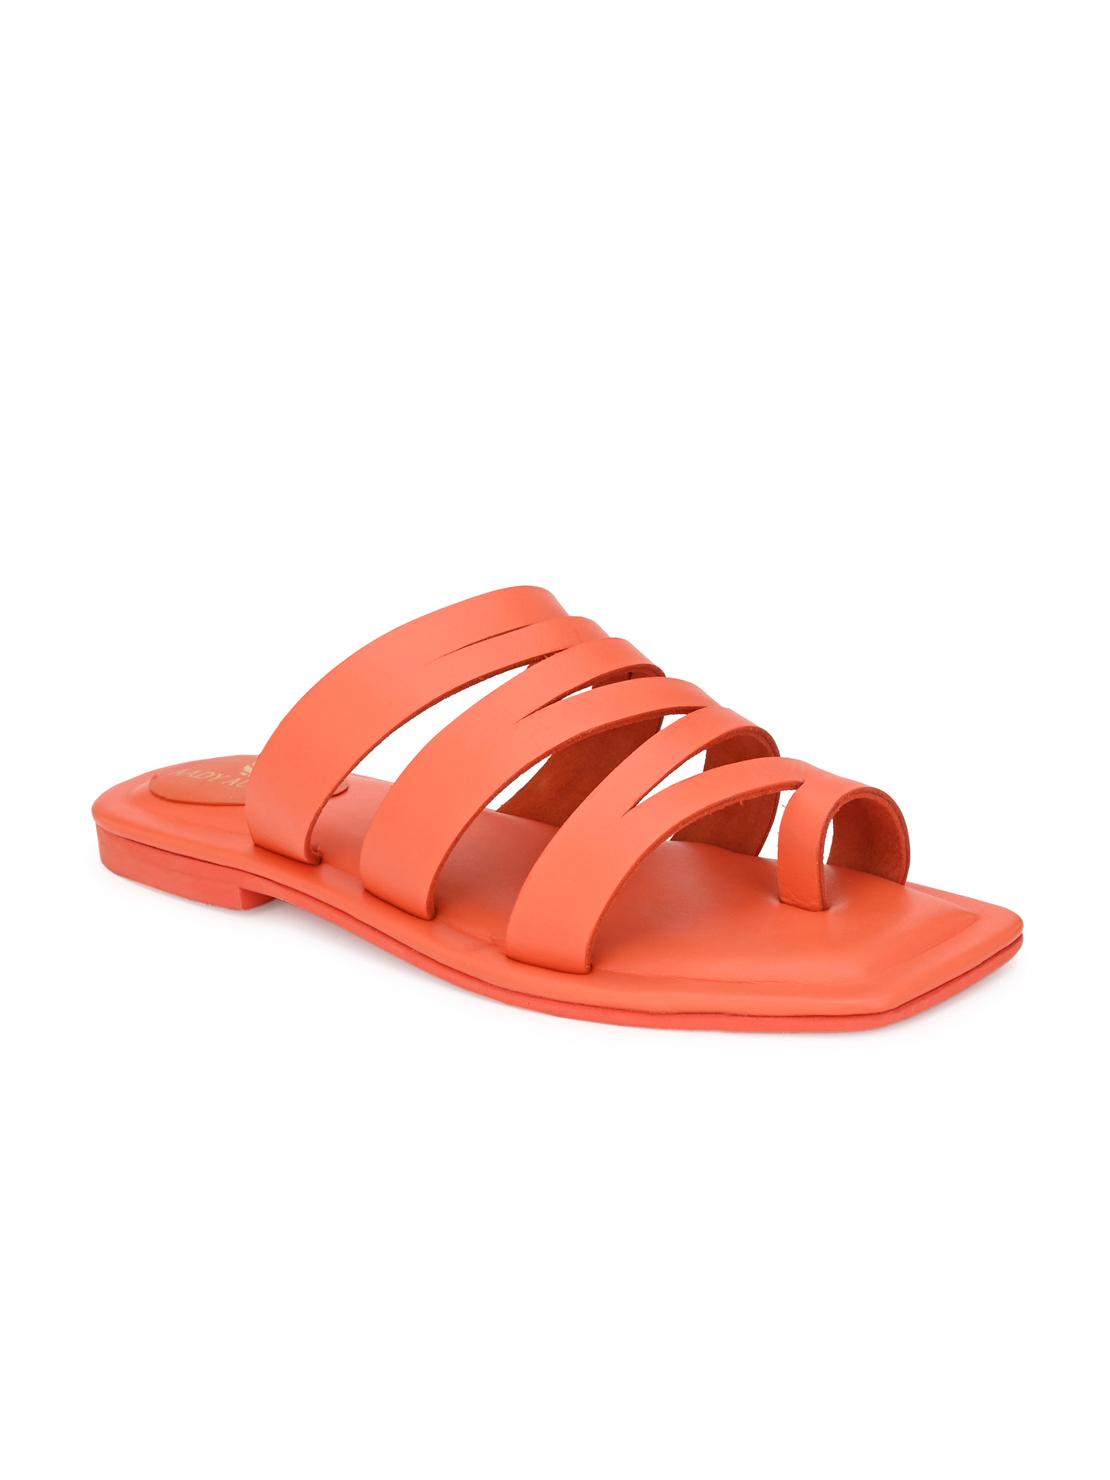 AADY AUSTIN | Aady Austin Women's Trendy Orange Square Toe Flats